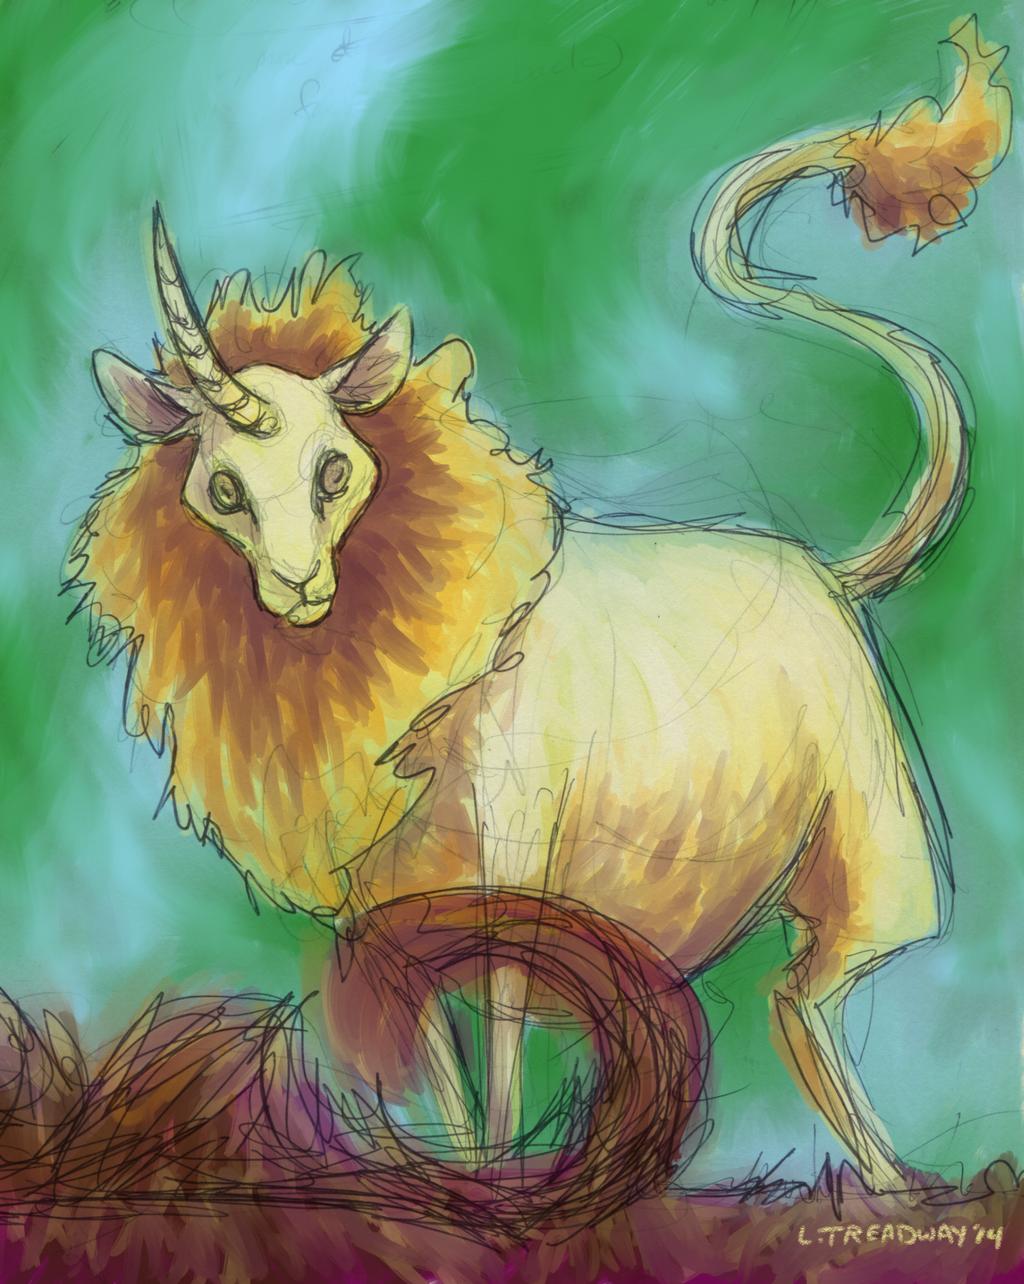 Sheepicorn by ltread